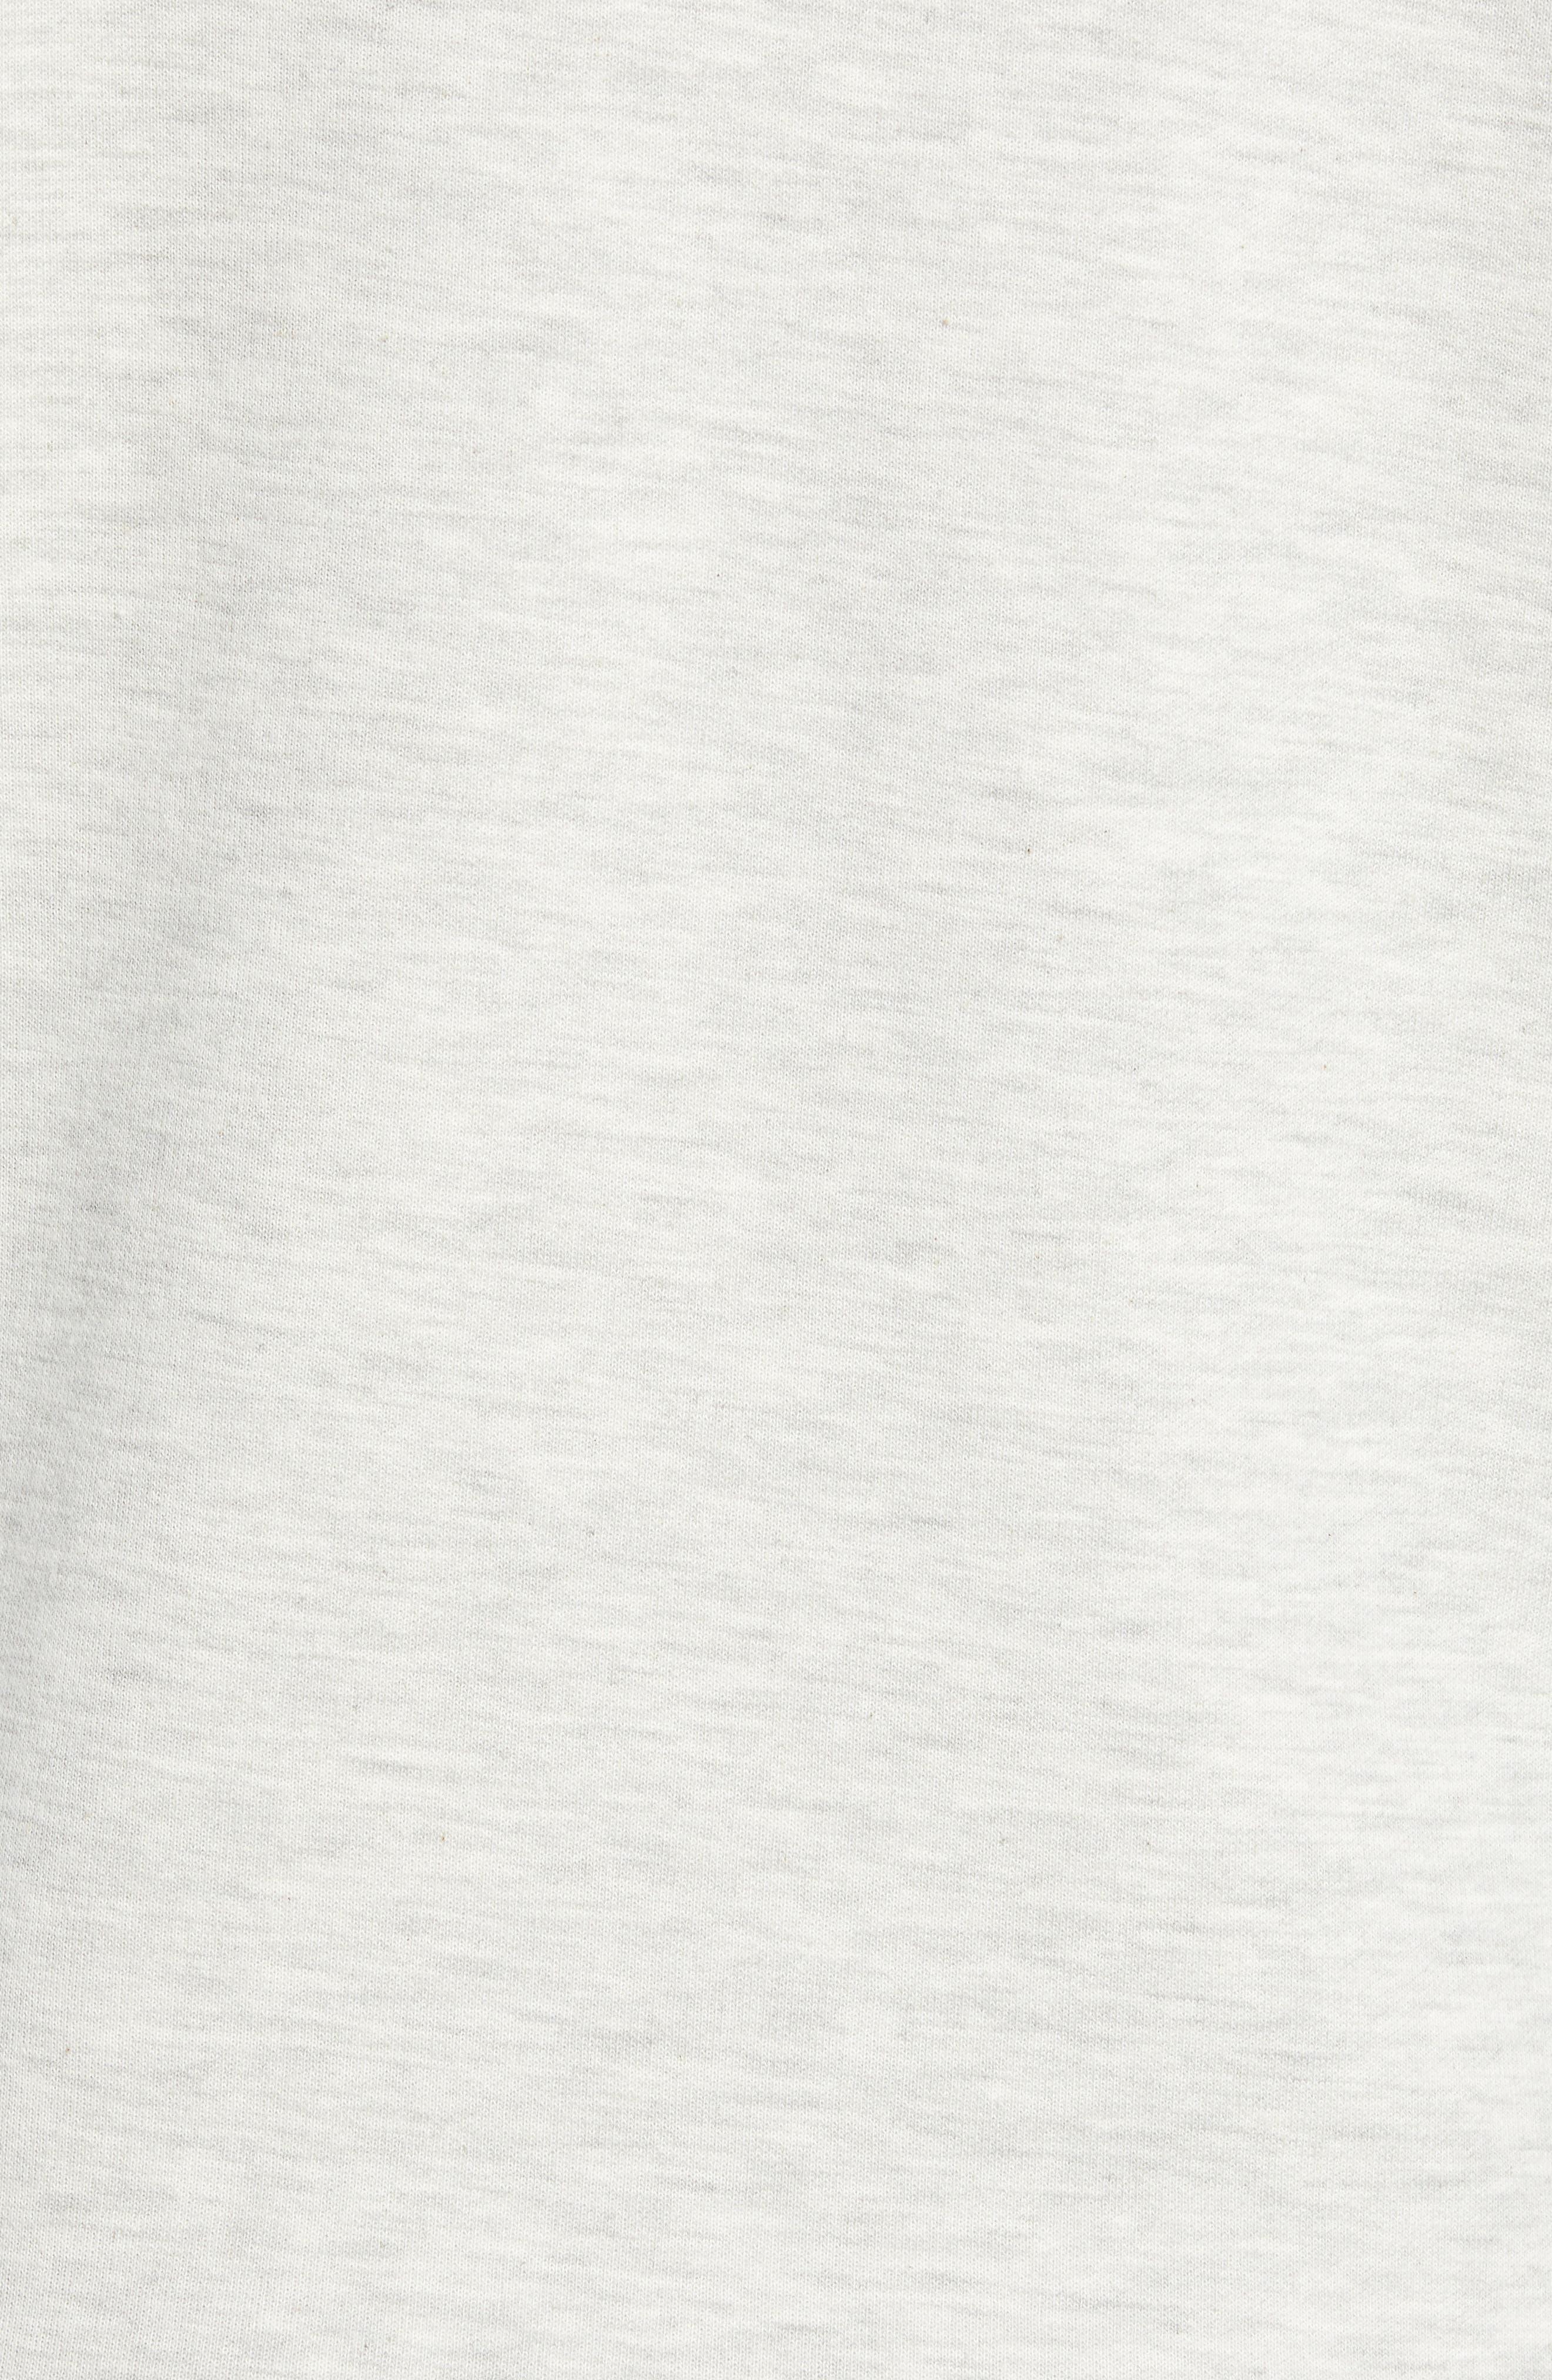 Magiics Slim Fit Quilted Sweatshirt,                             Alternate thumbnail 5, color,                             LIGHT GREY